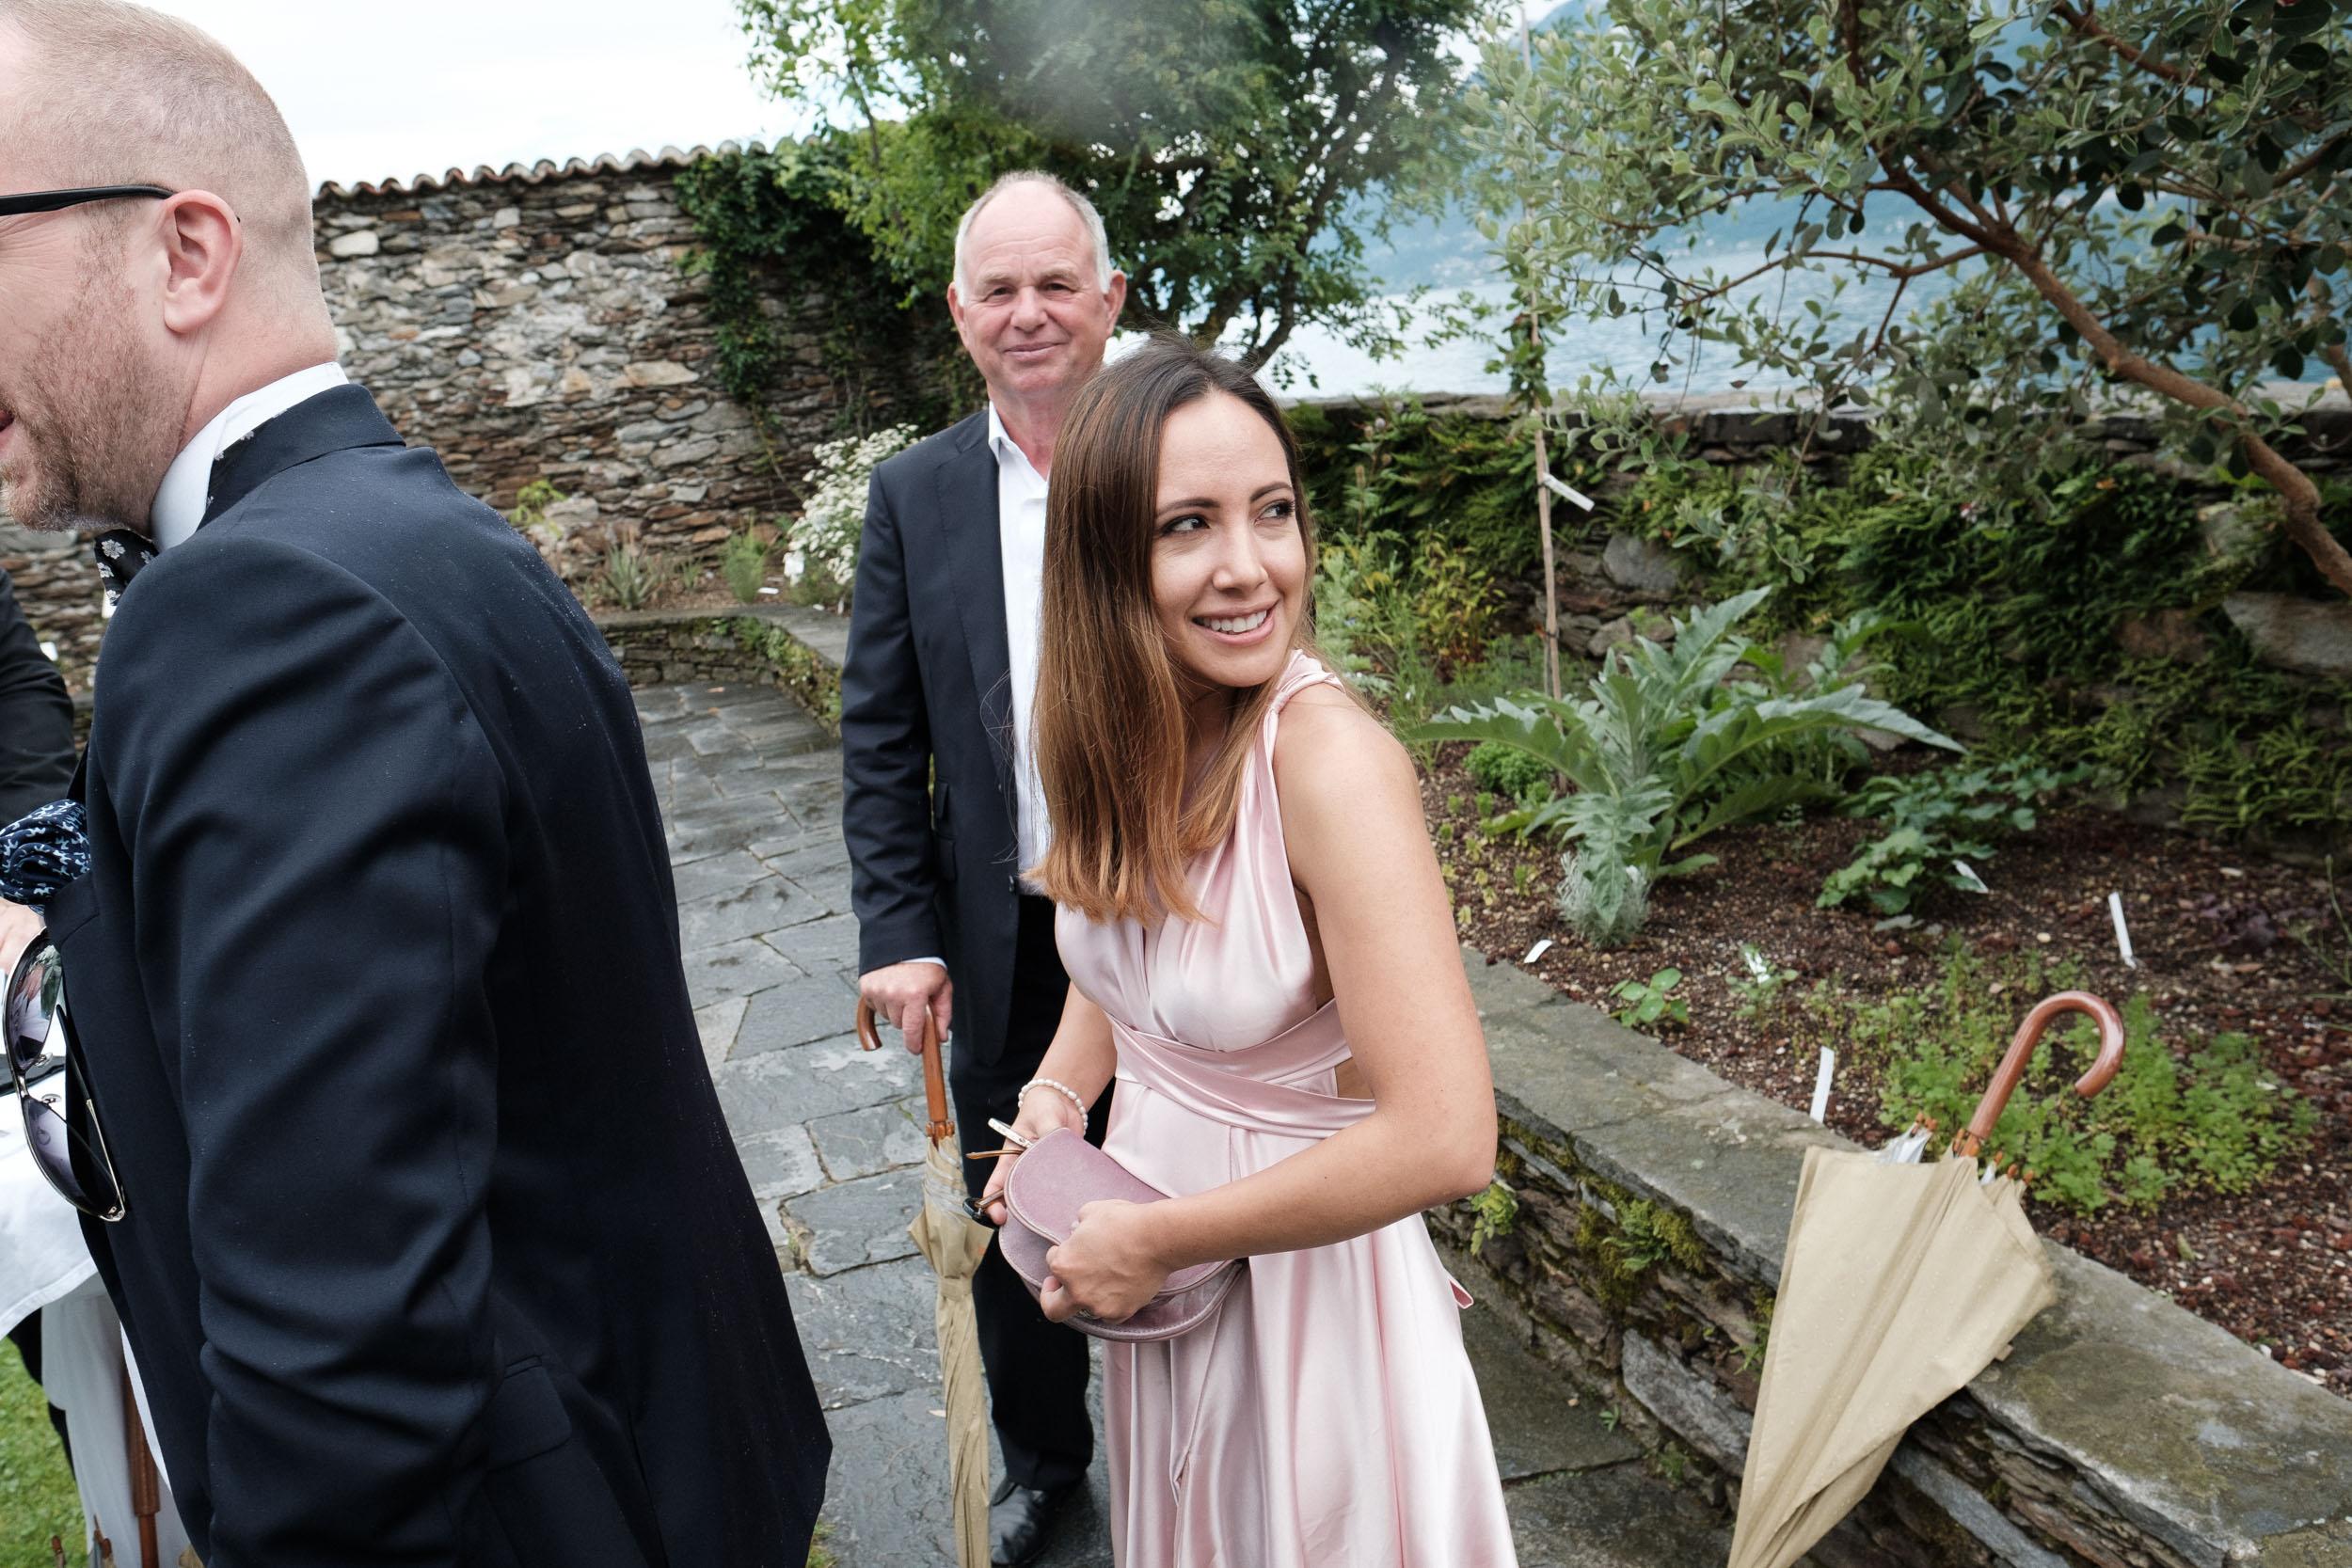 olivia-andreas-wedding-switzerland-259.jpg